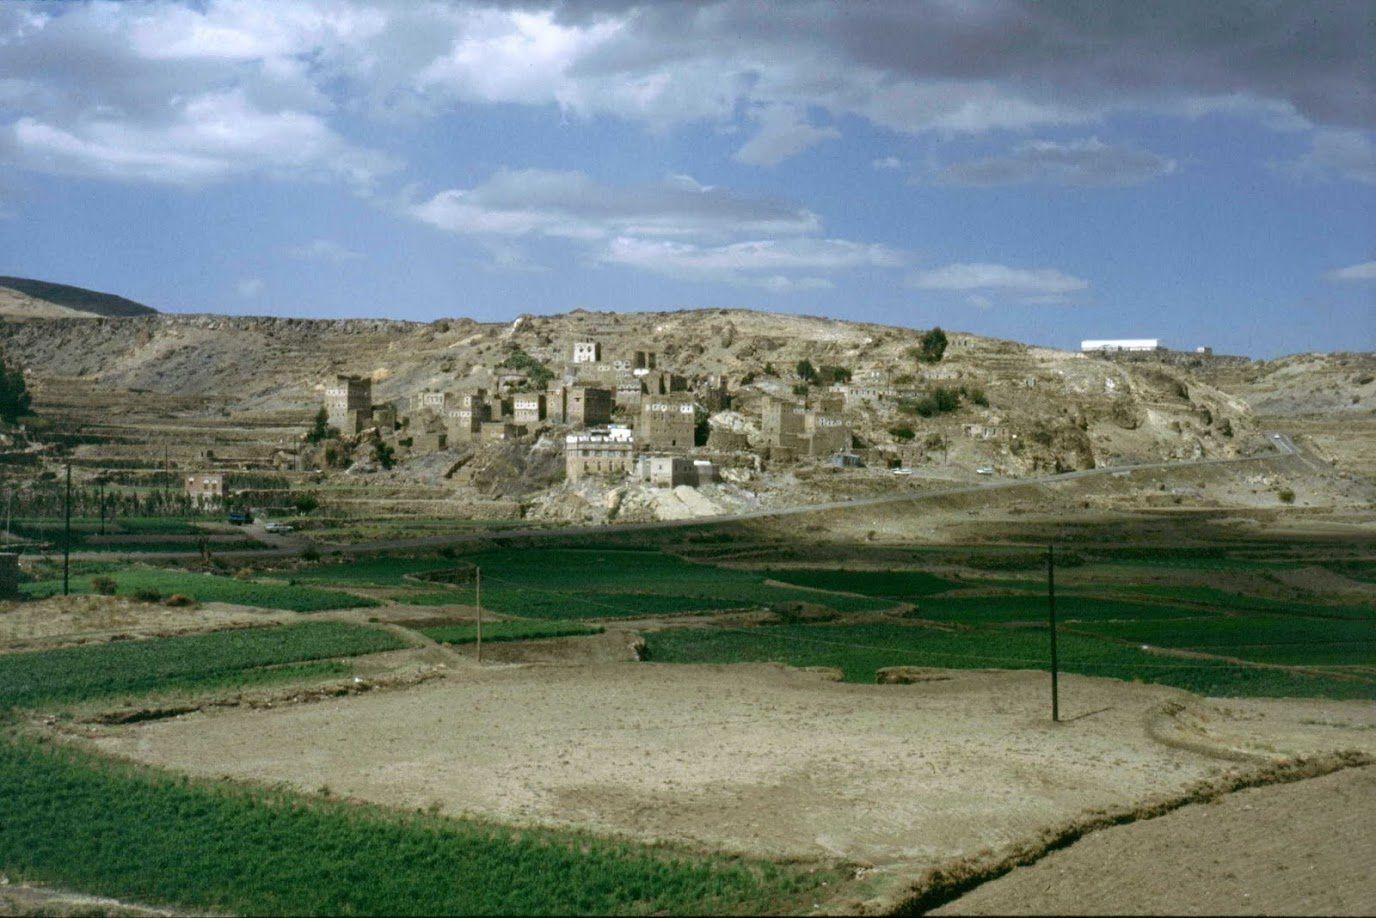 En direction de Sanaa